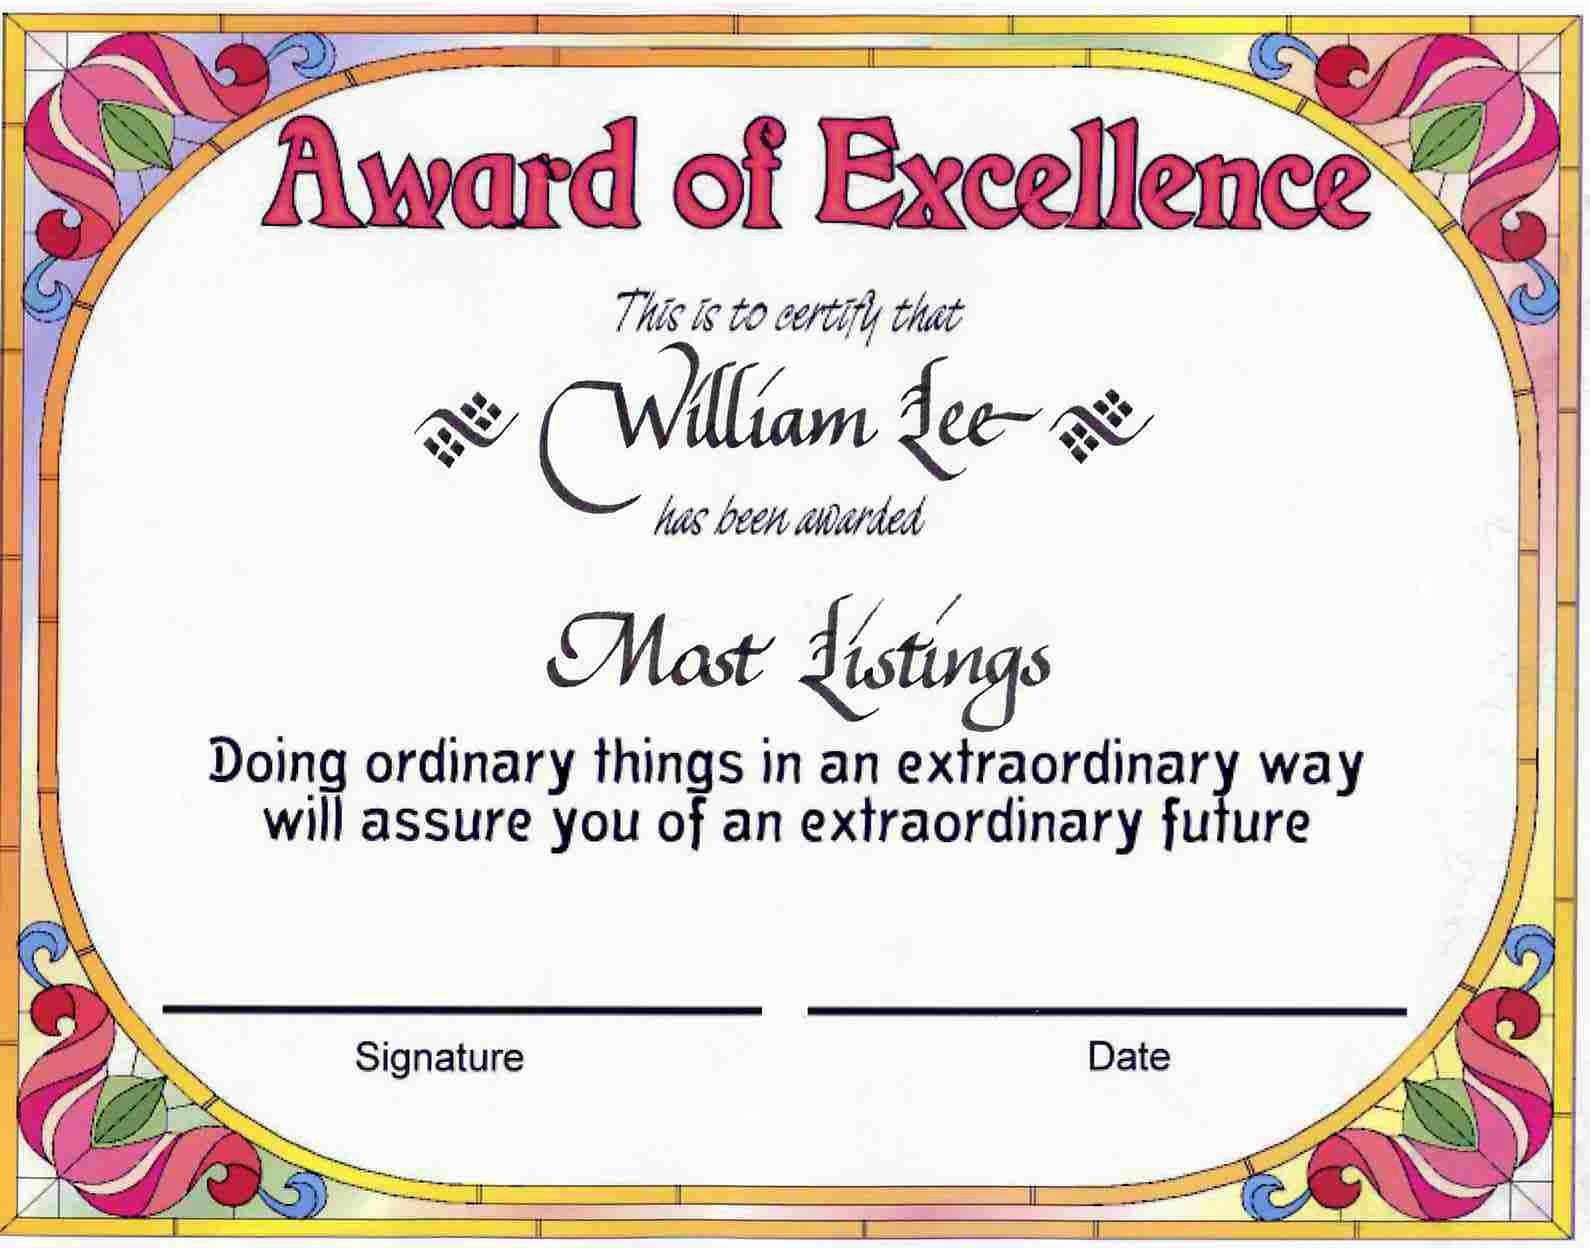 Employee Award Certificate Templates Free Beautiful Employee Recognition Certificate Template